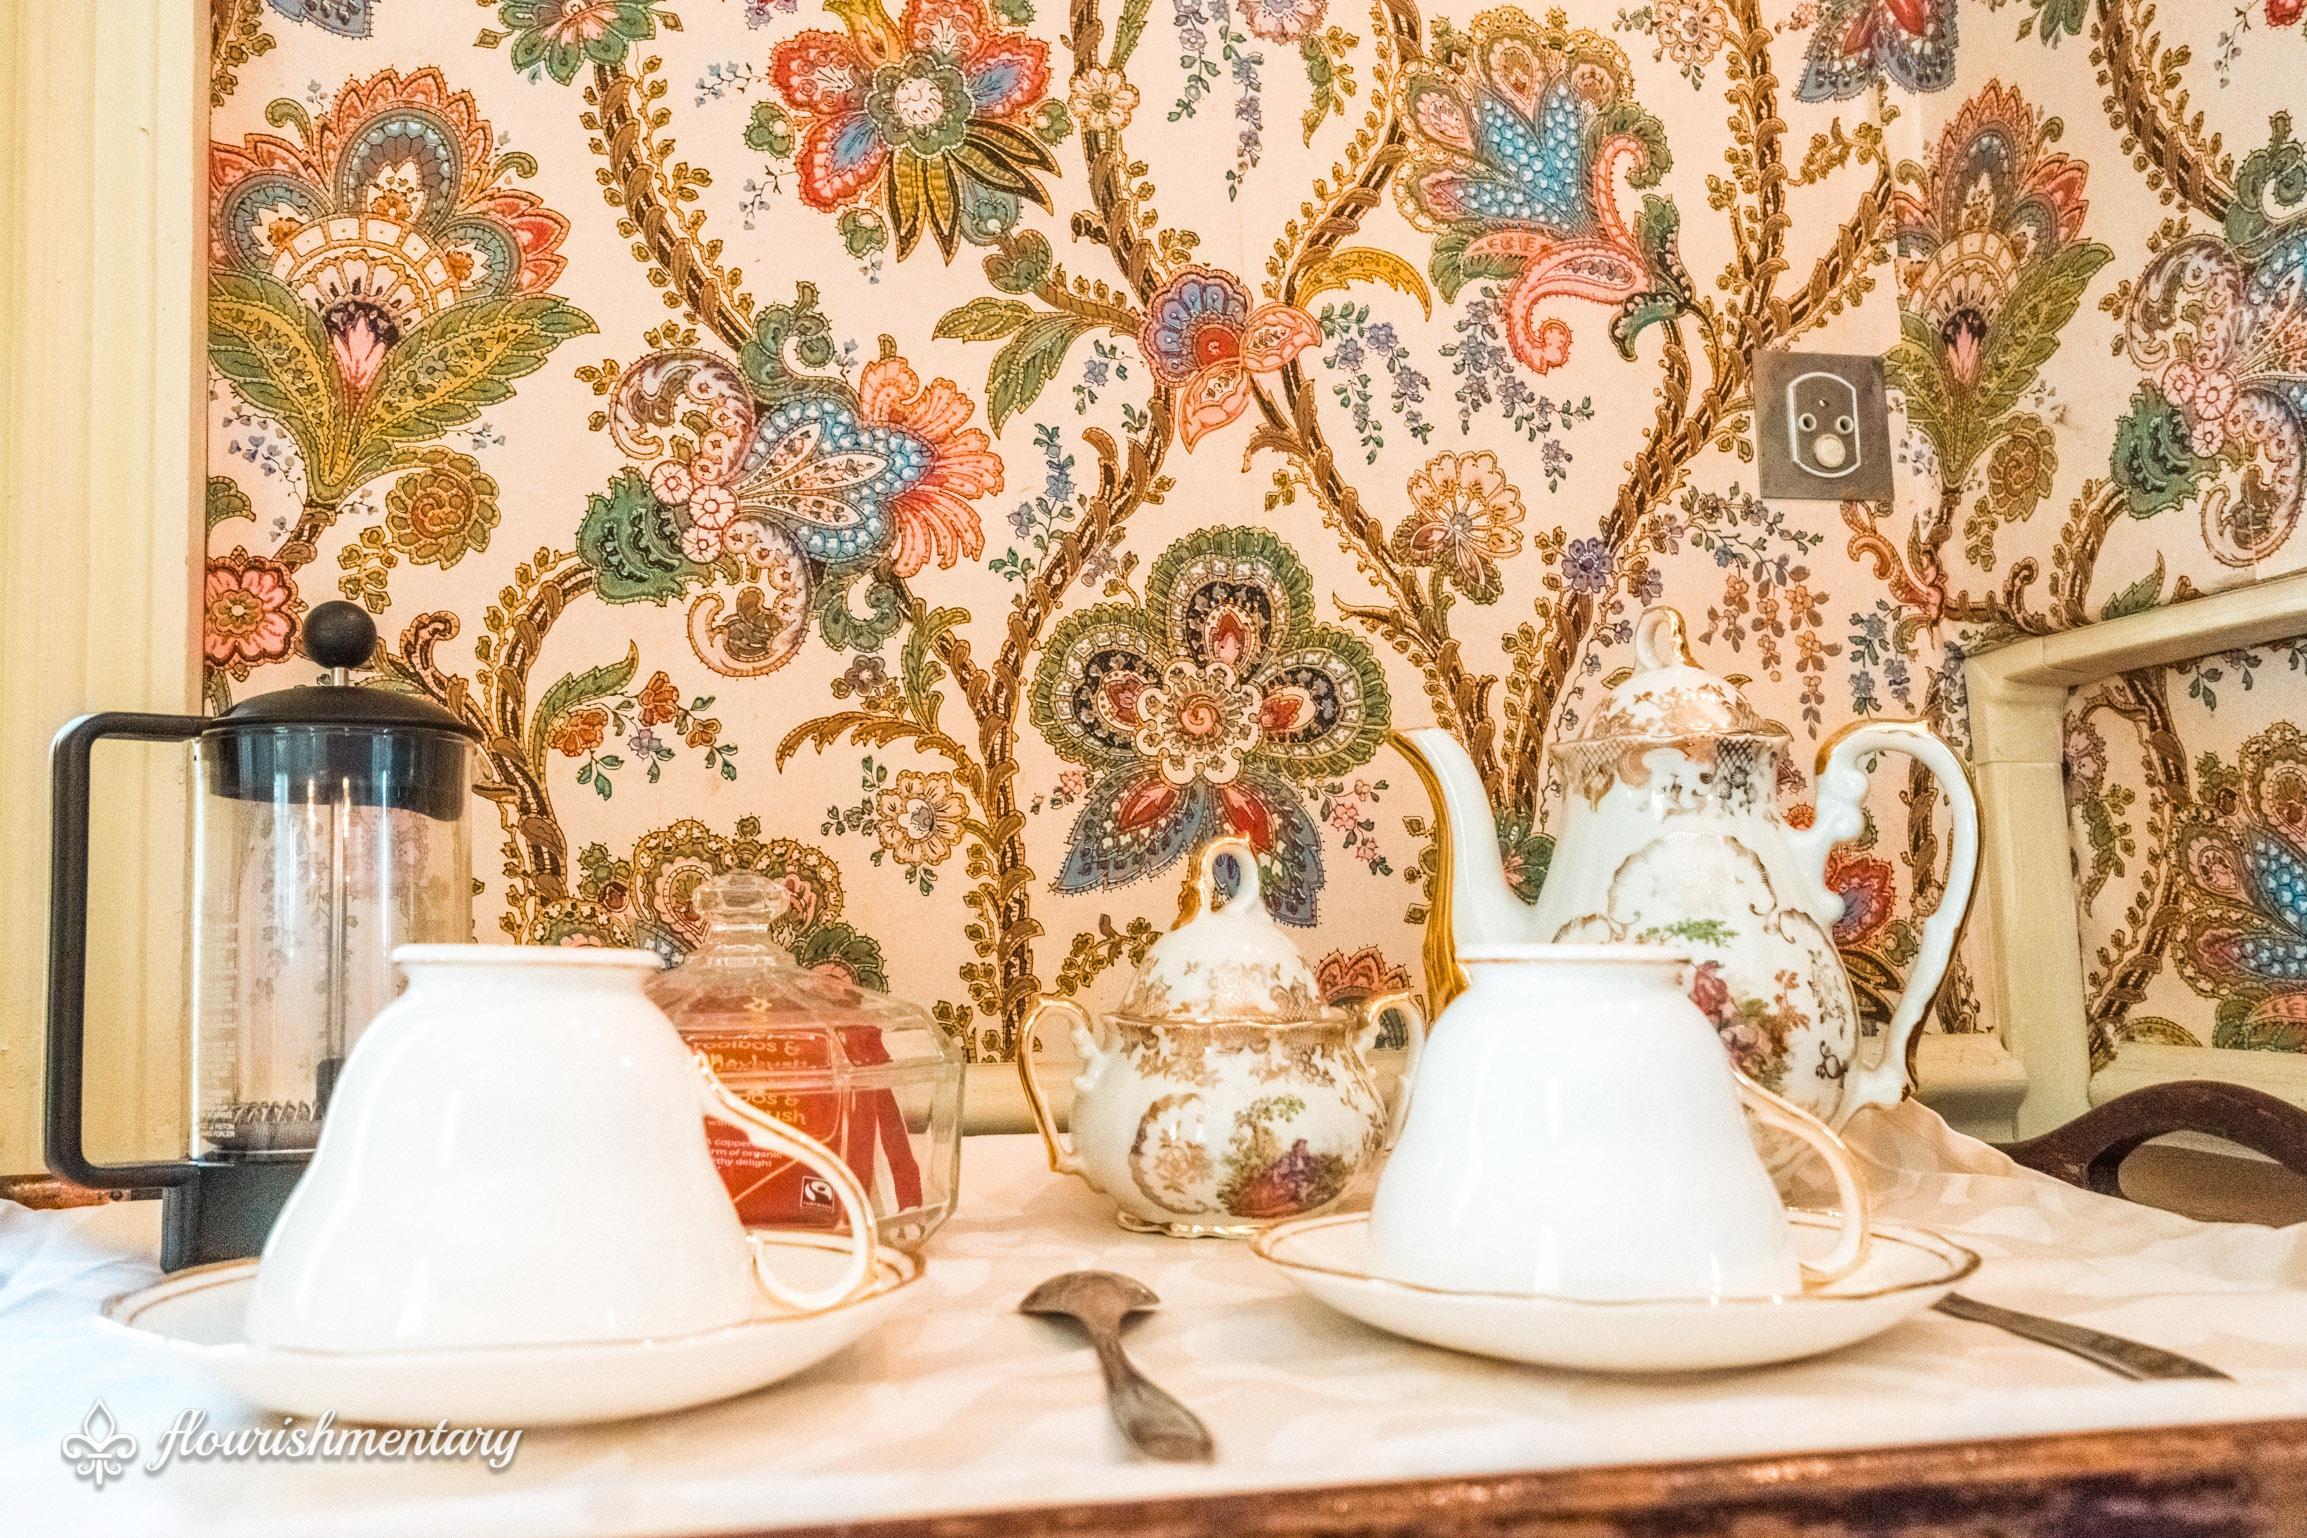 persian wallpaper and teacups chateau de lalande